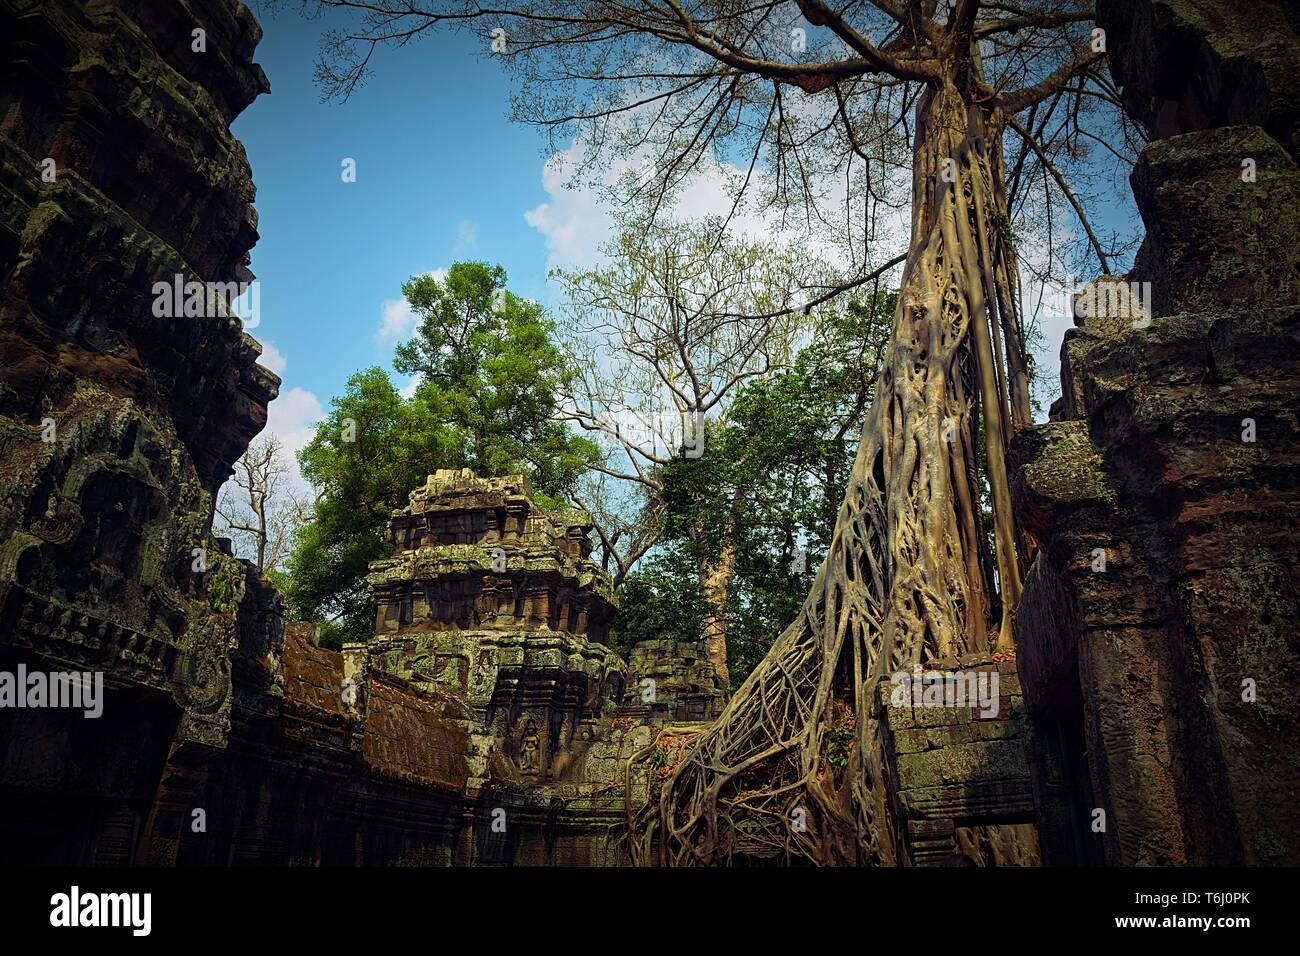 Views from Angkor Wat in Cambodia - Stock Image